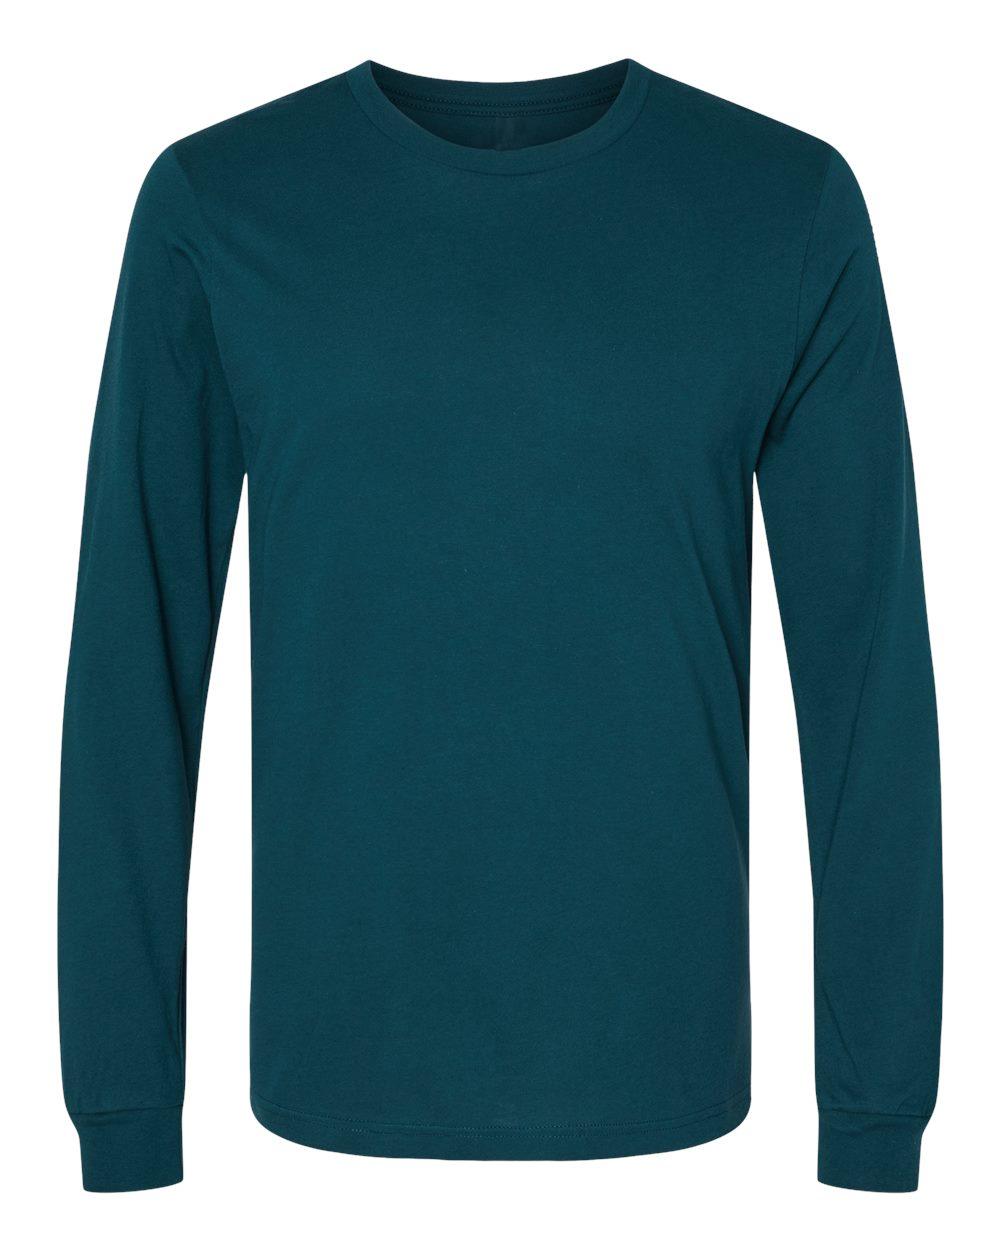 Bella-Canvas-Mens-Blank-Top-Long-Sleeve-Jersey-Tee-T-Shirt-3501-up-to-3XL thumbnail 12